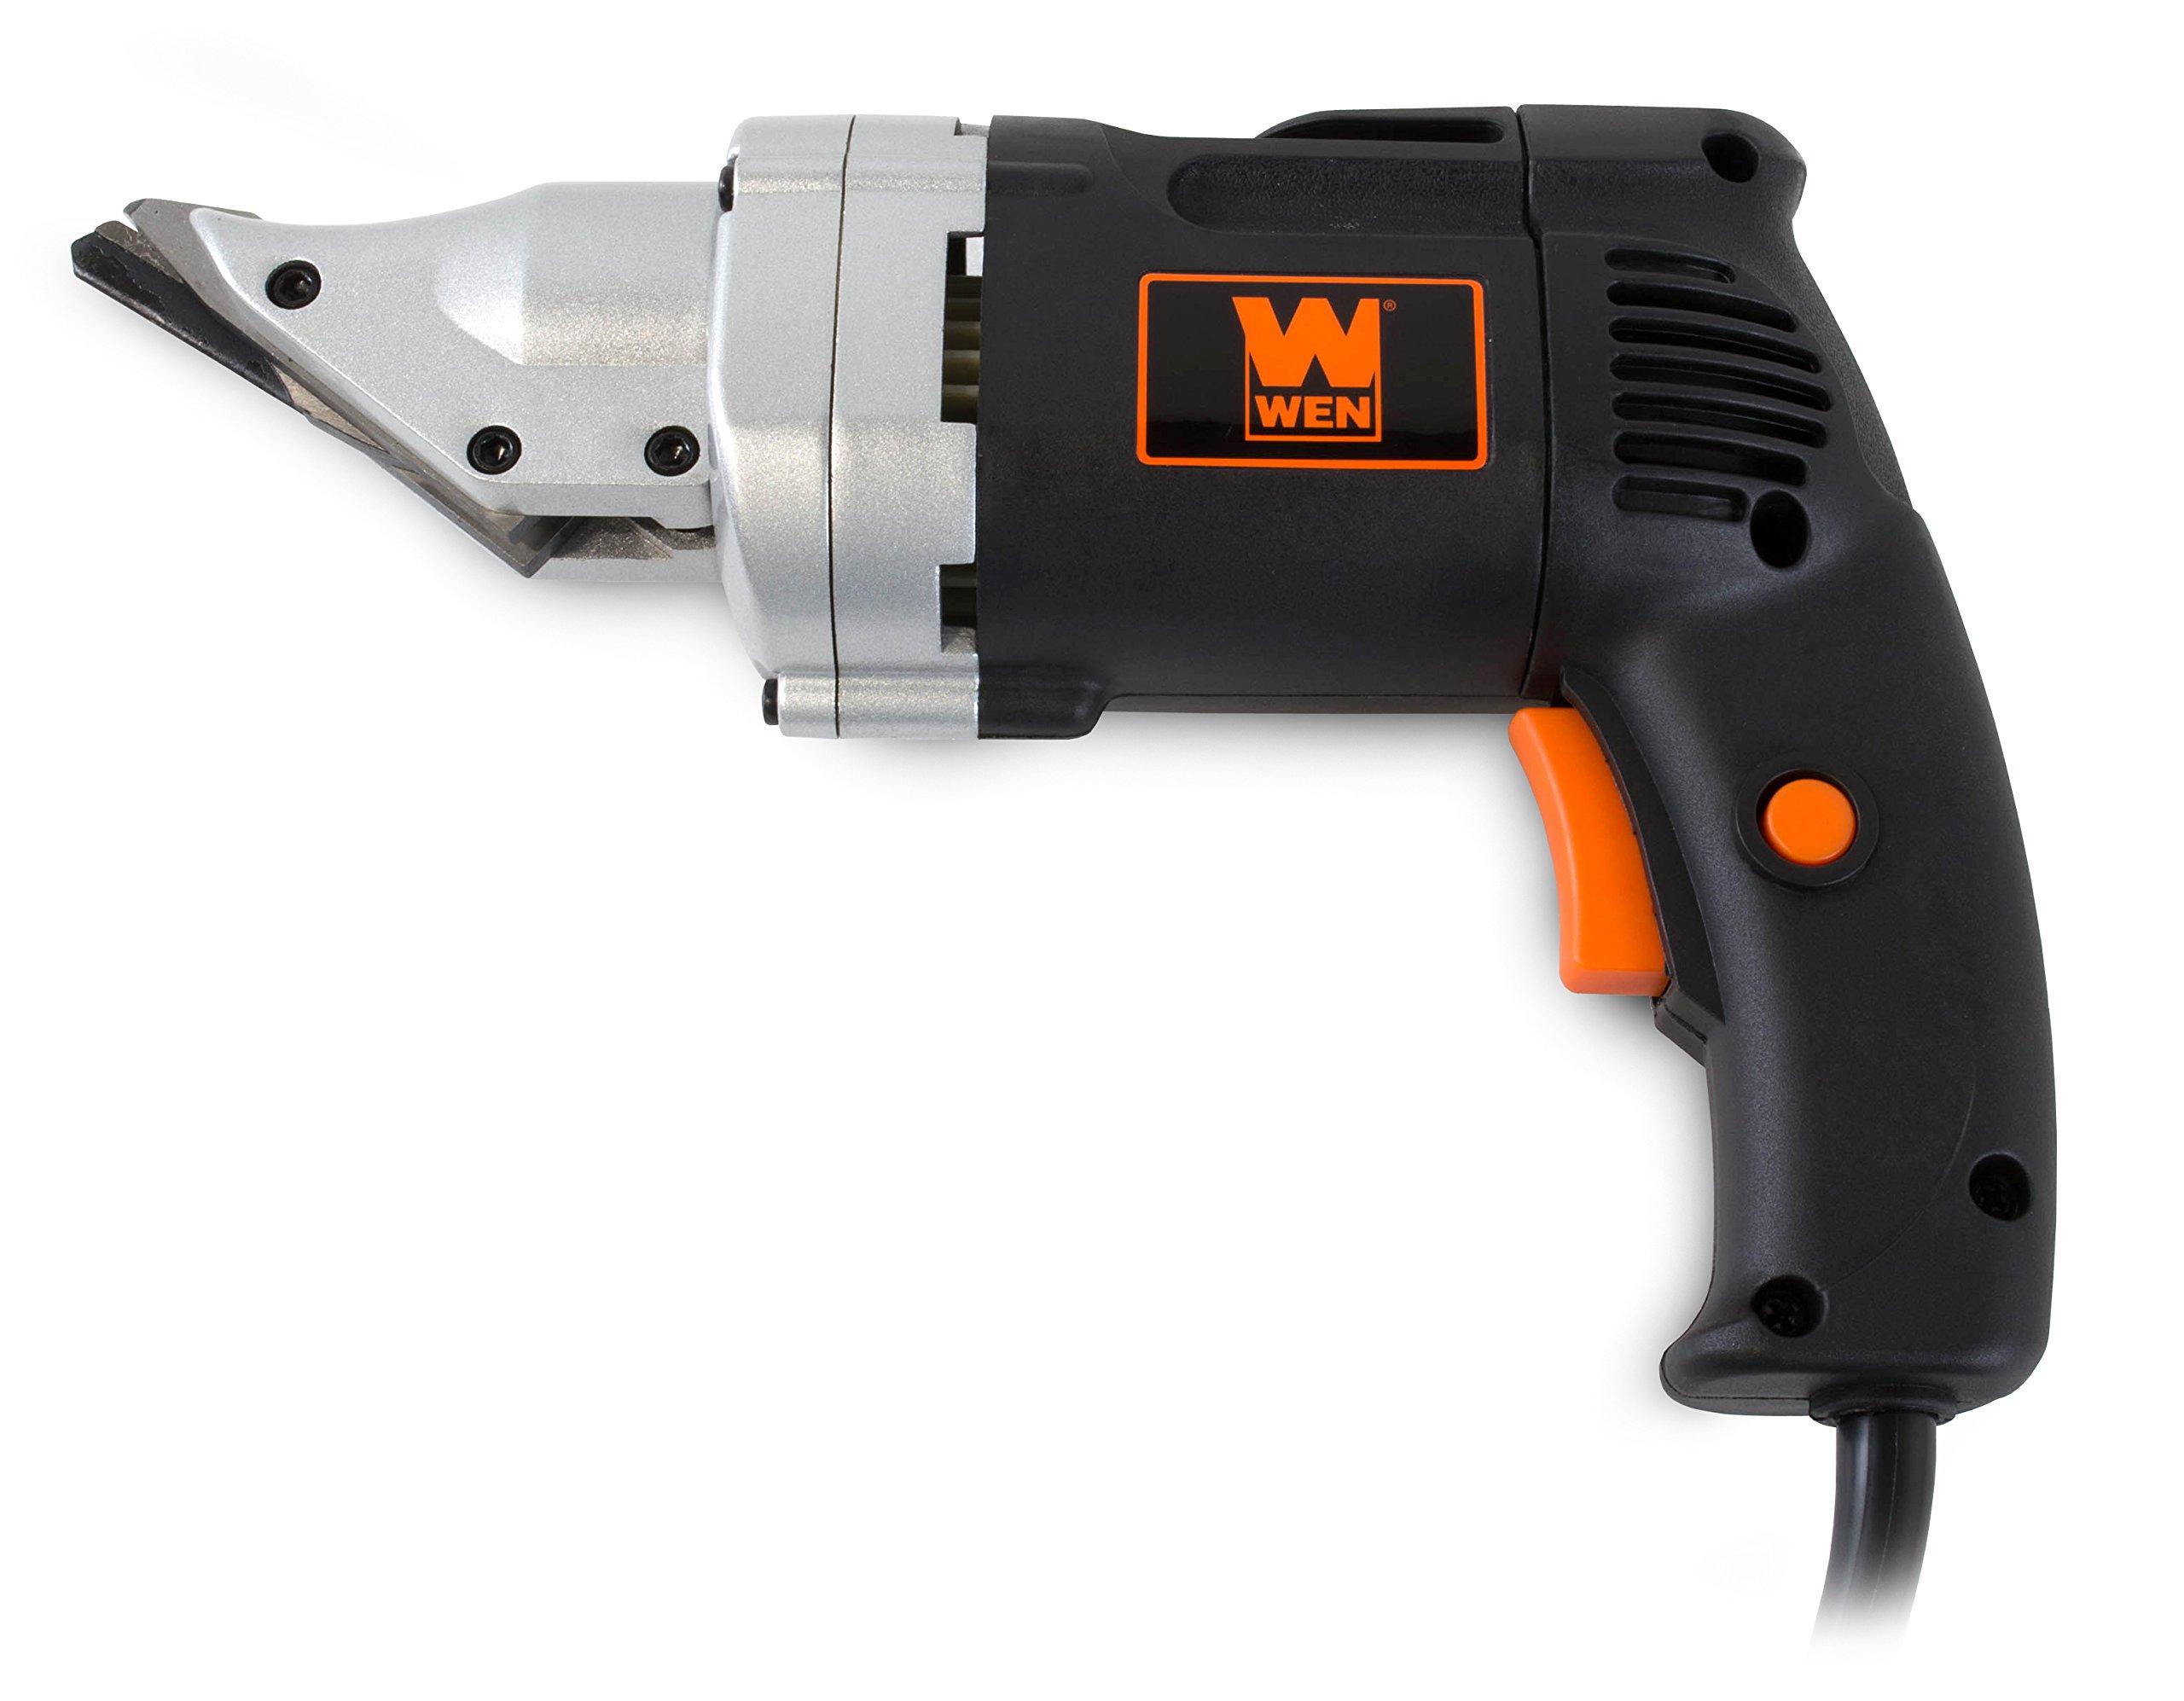 WEN 3650 4.0-Amp Corded Variable Speed Swivel Head Electric Metal Cutter Shear by WEN